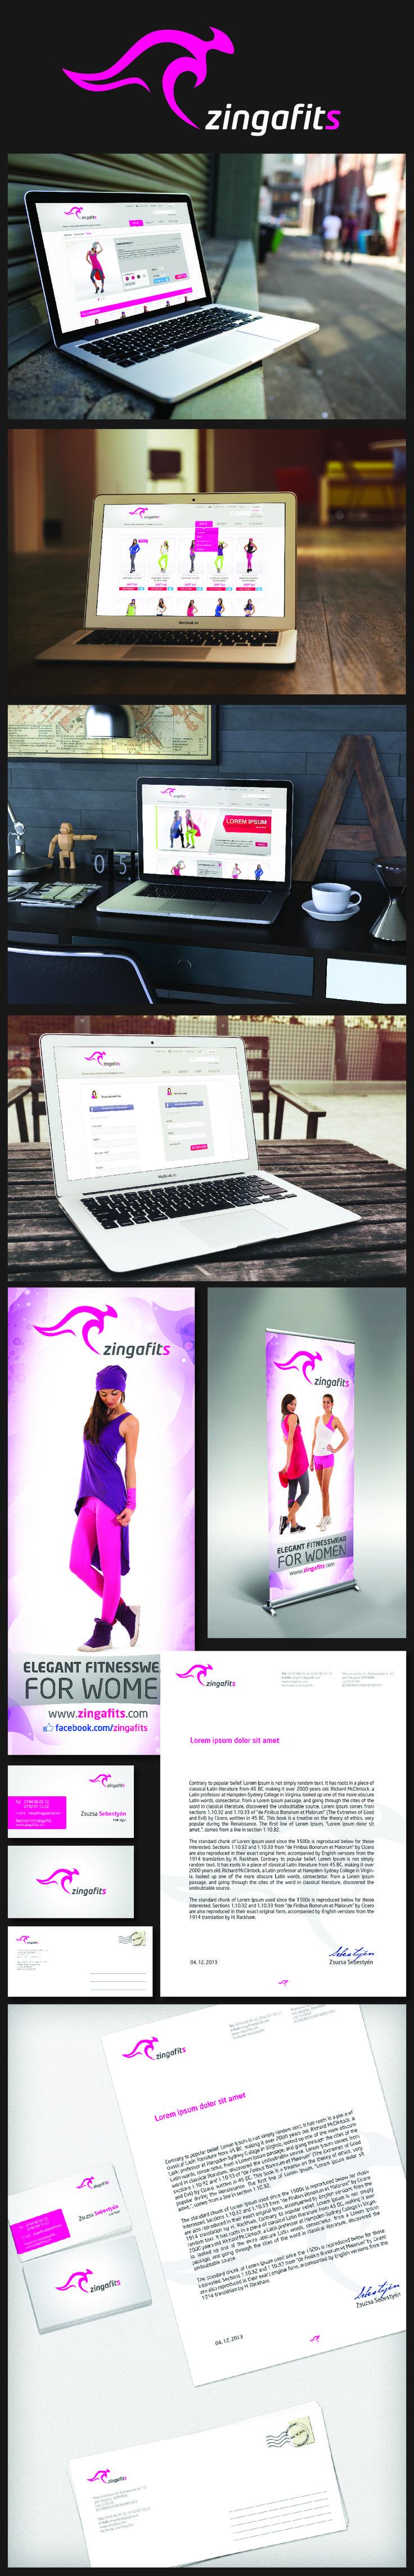 Logo - Business Card - Flyer - Rollup - Header - Webshop design - ZingaFitS Sportswear Company